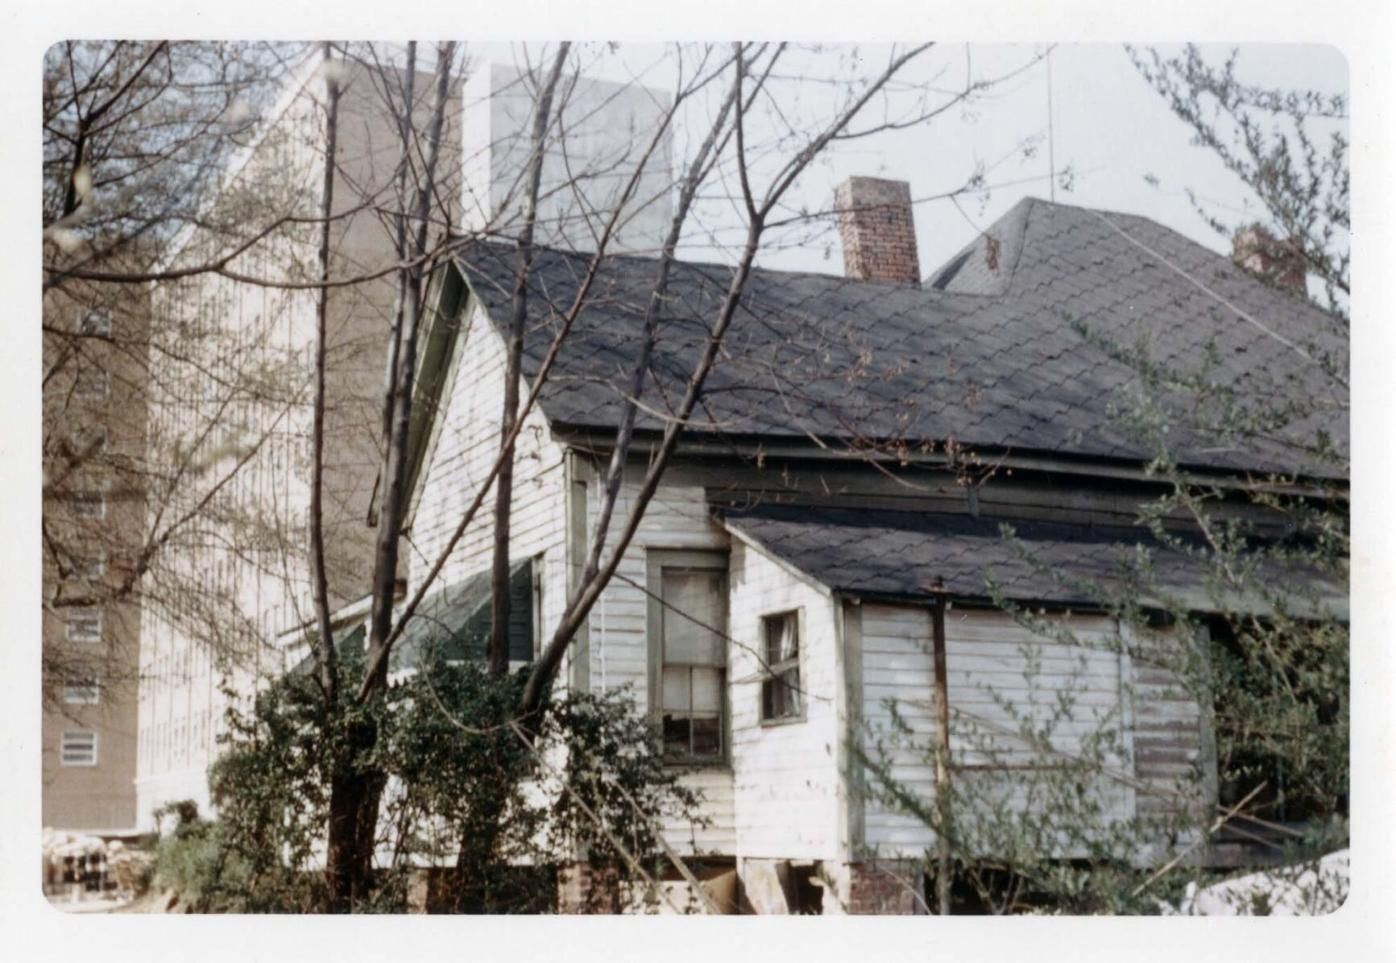 Linnentown House